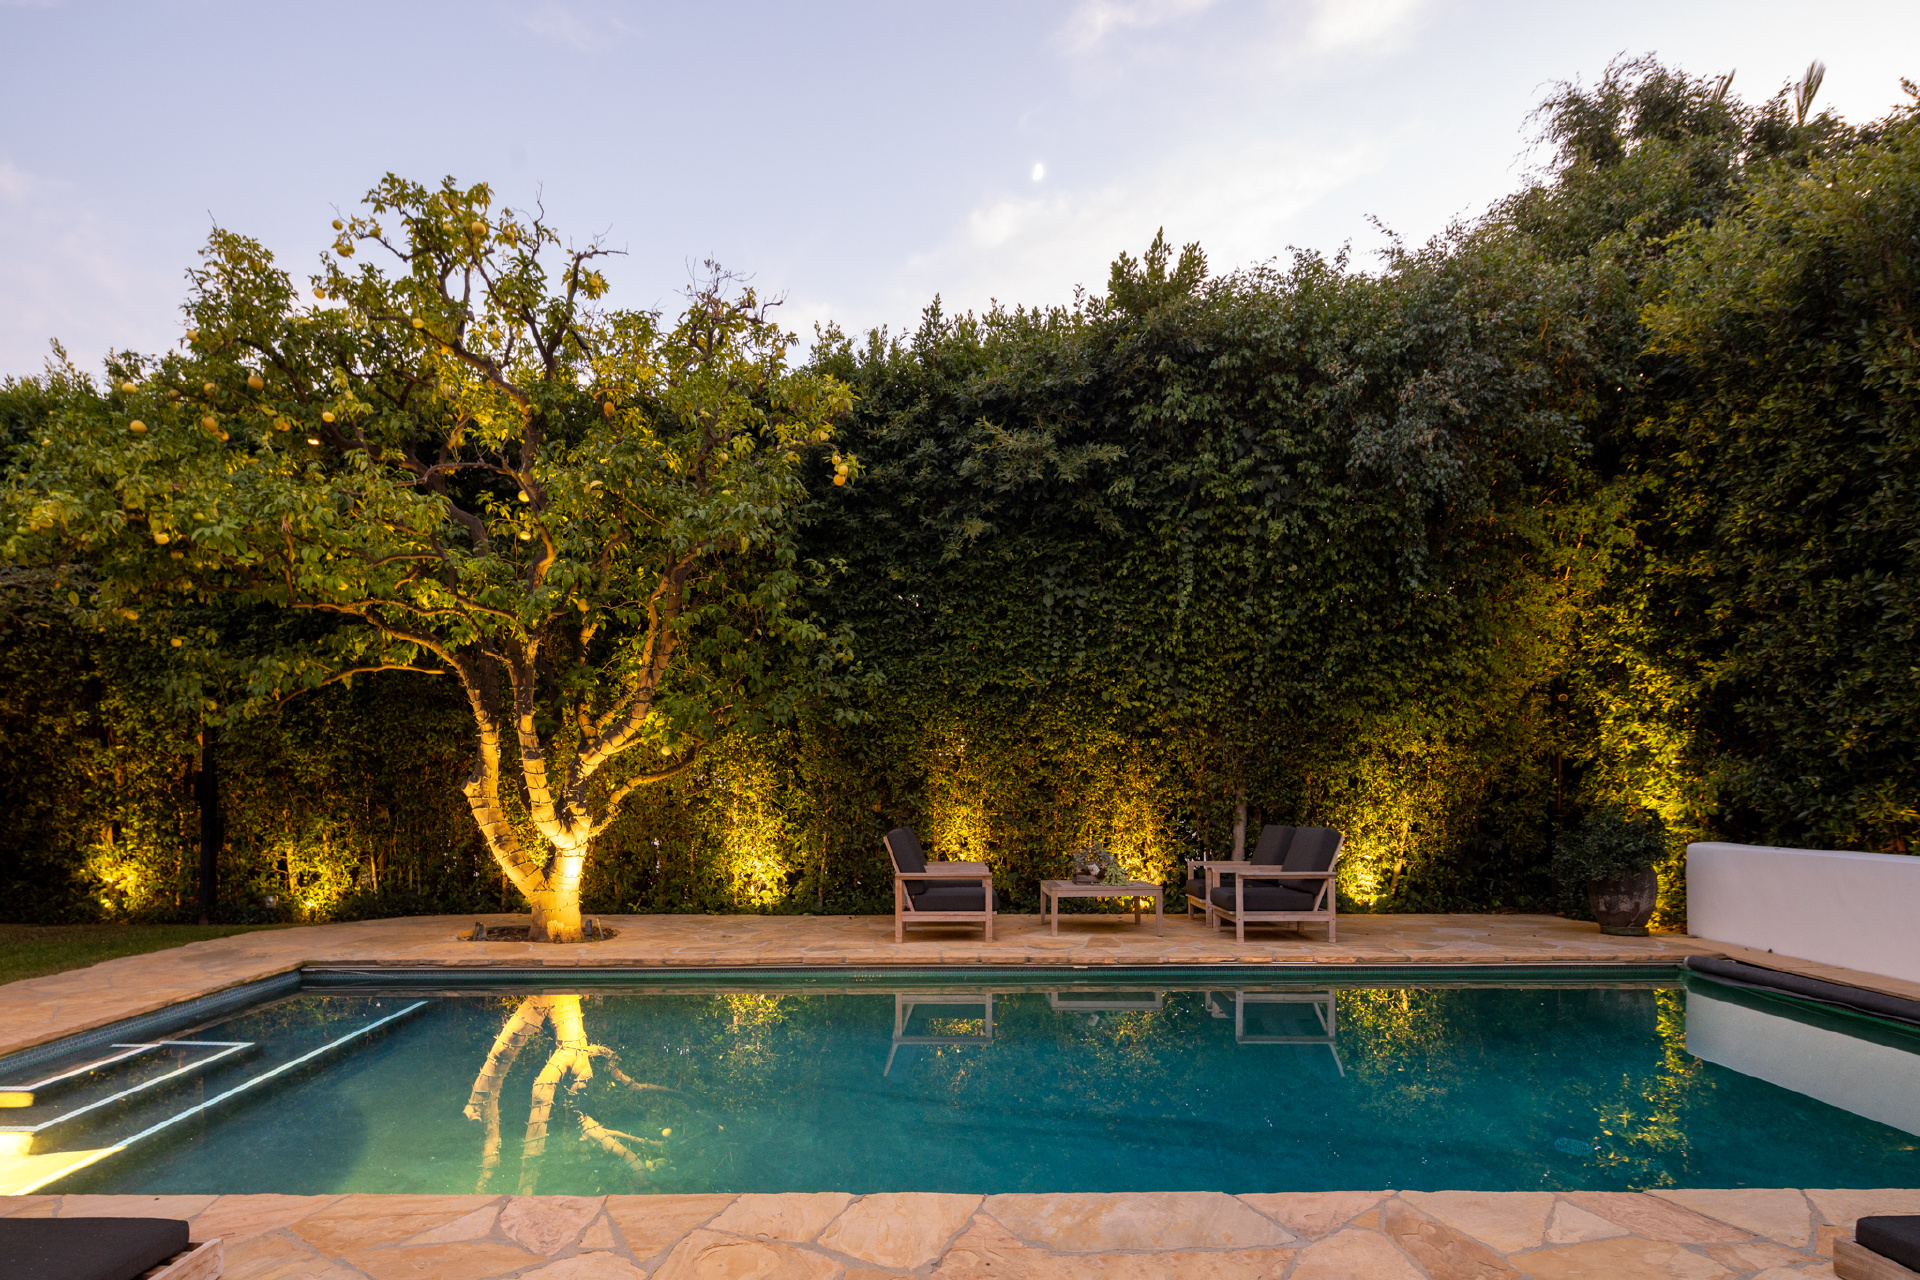 1355 North Doheny Drive     |     Sunset Strip Los Angeles  CA  | Jonah Wilson